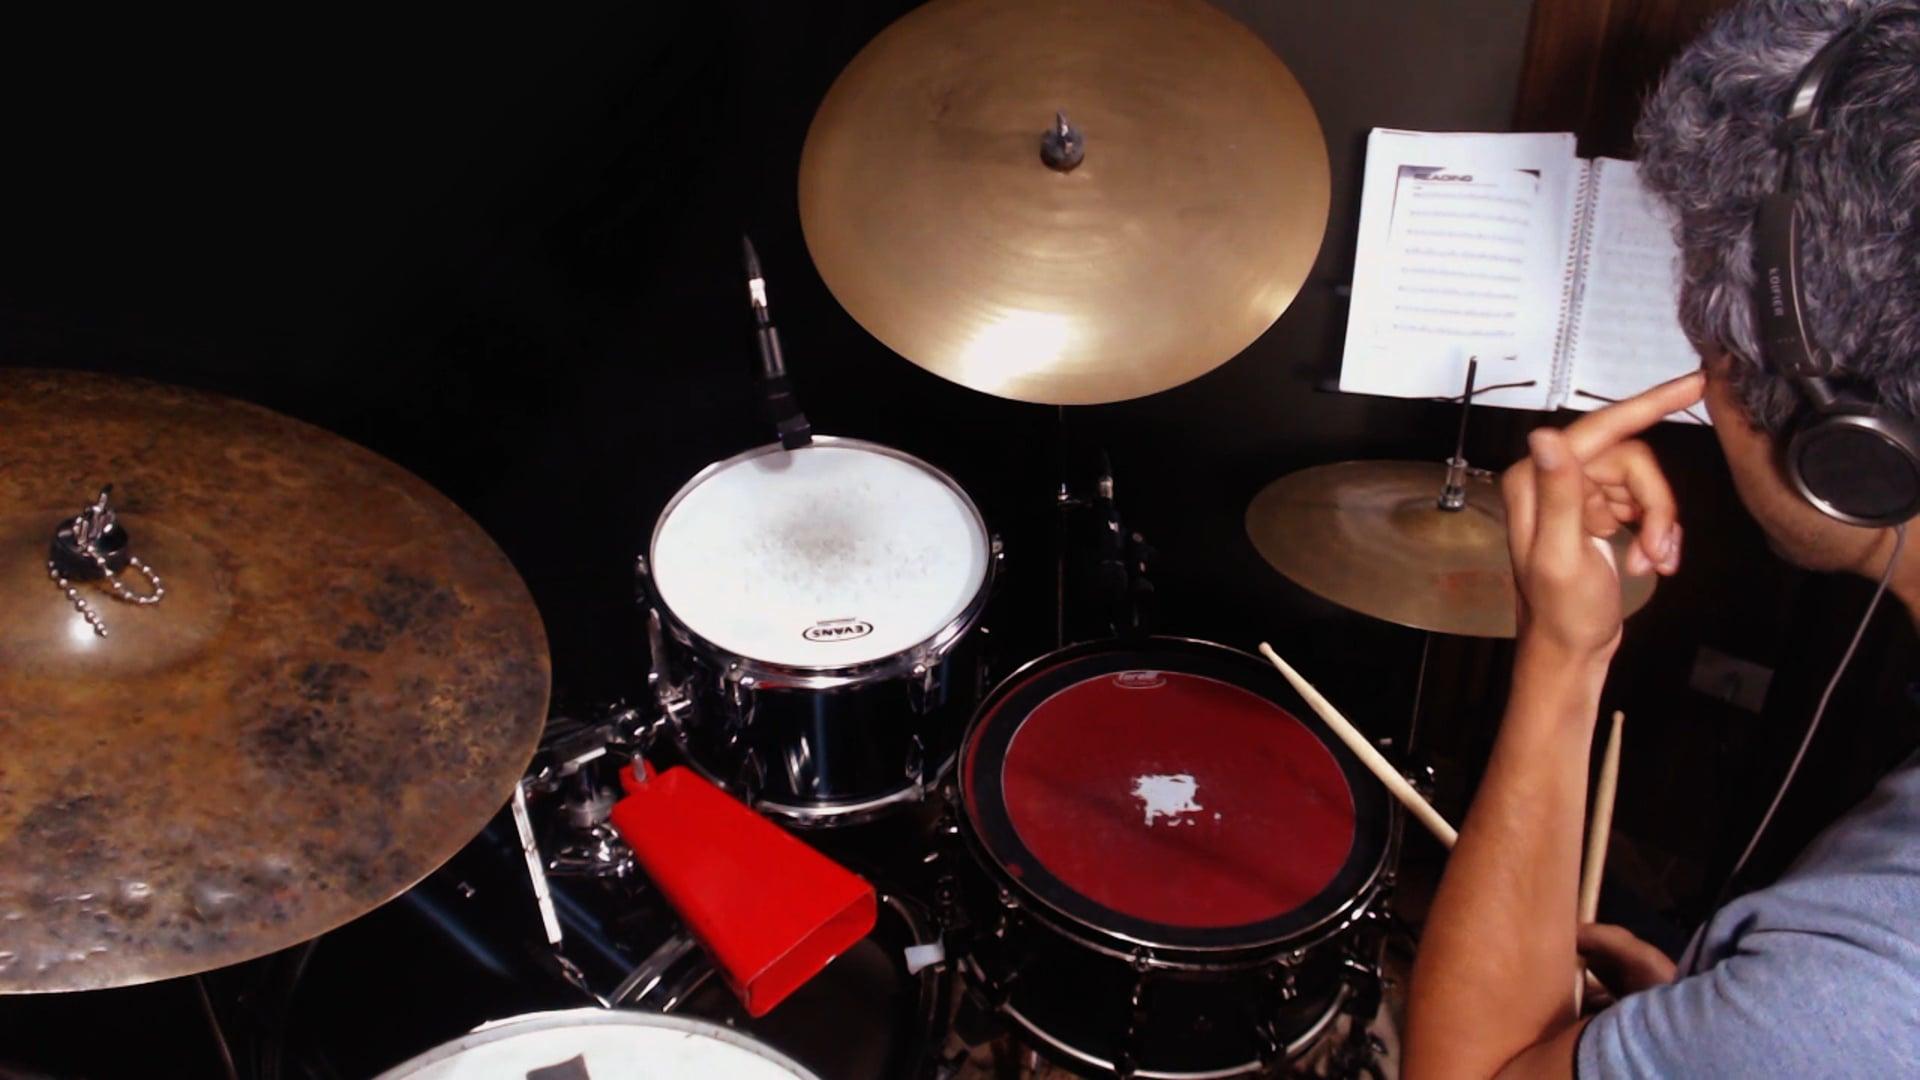 Variações de bumbo - Gary Chaster 1